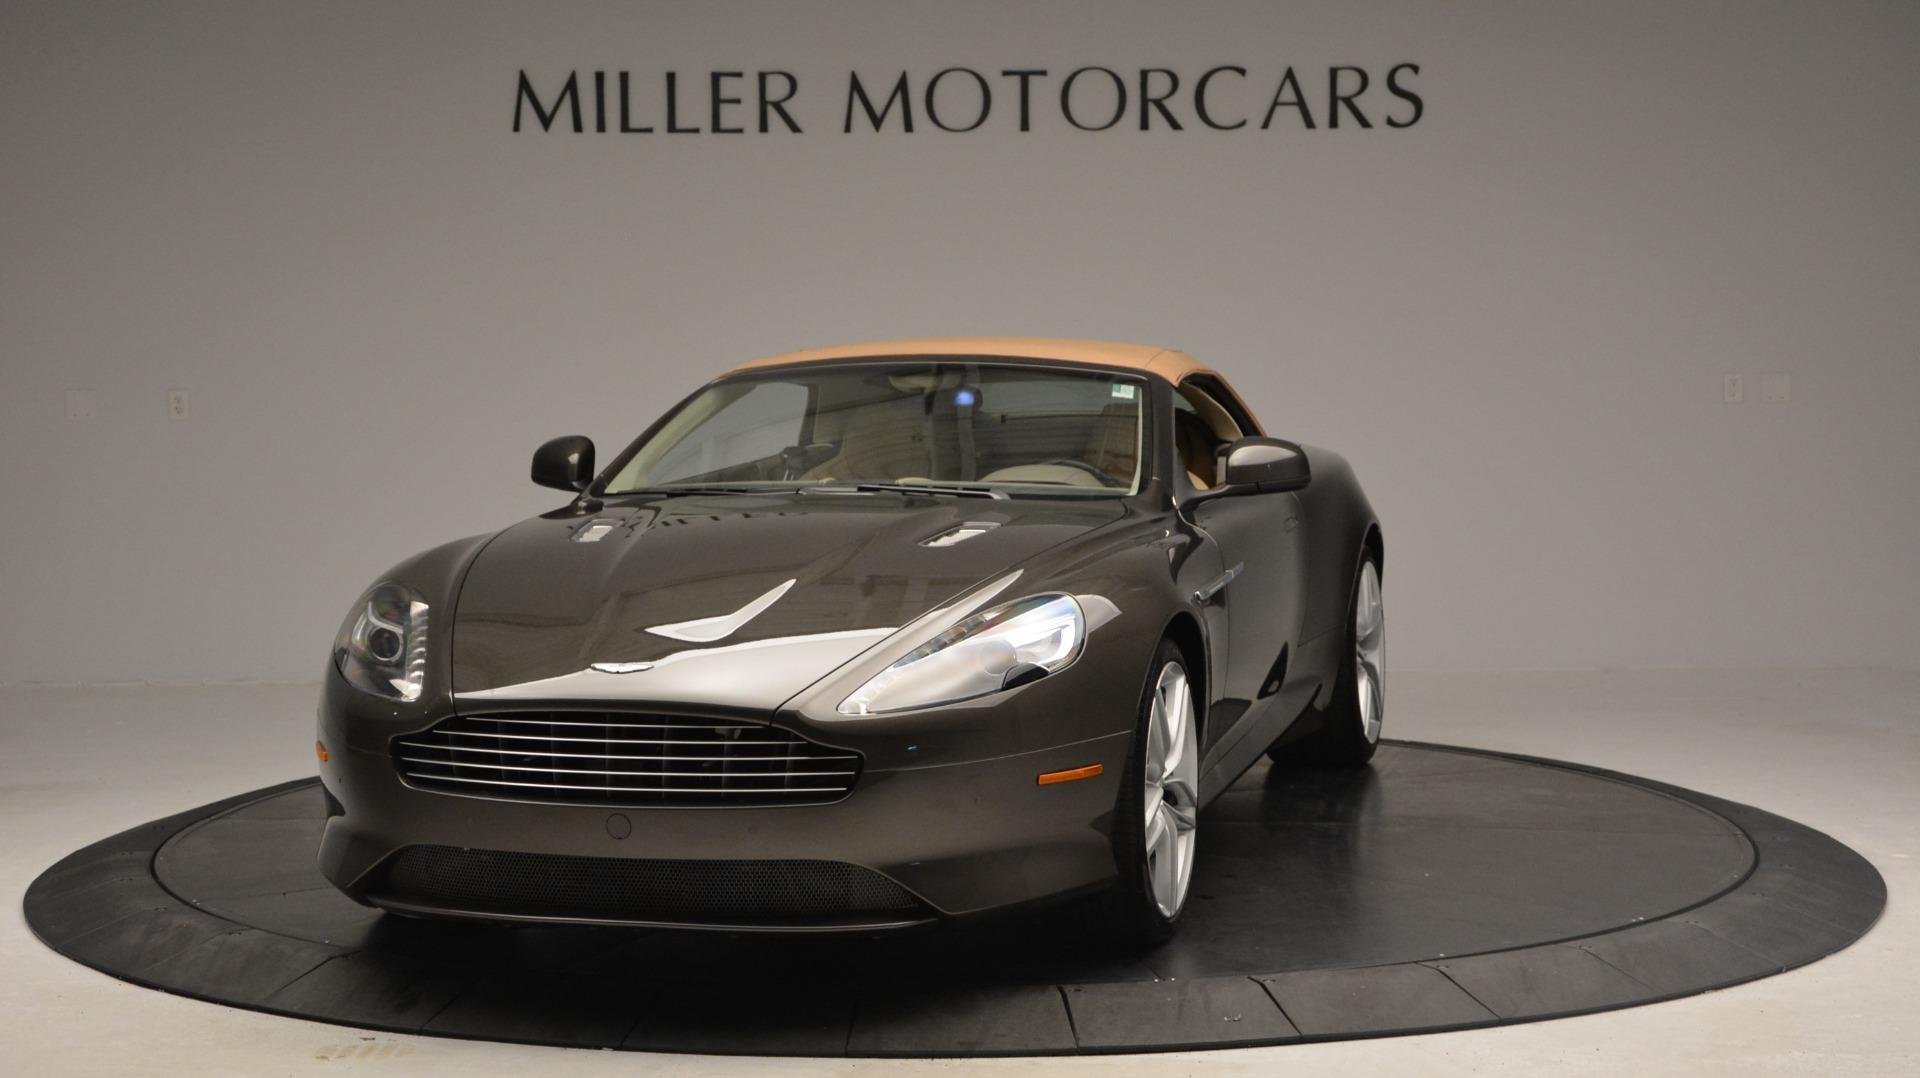 Used 2012 Aston Martin Virage Convertible For Sale In Greenwich, CT. Alfa Romeo of Greenwich, 7613 3351_p14